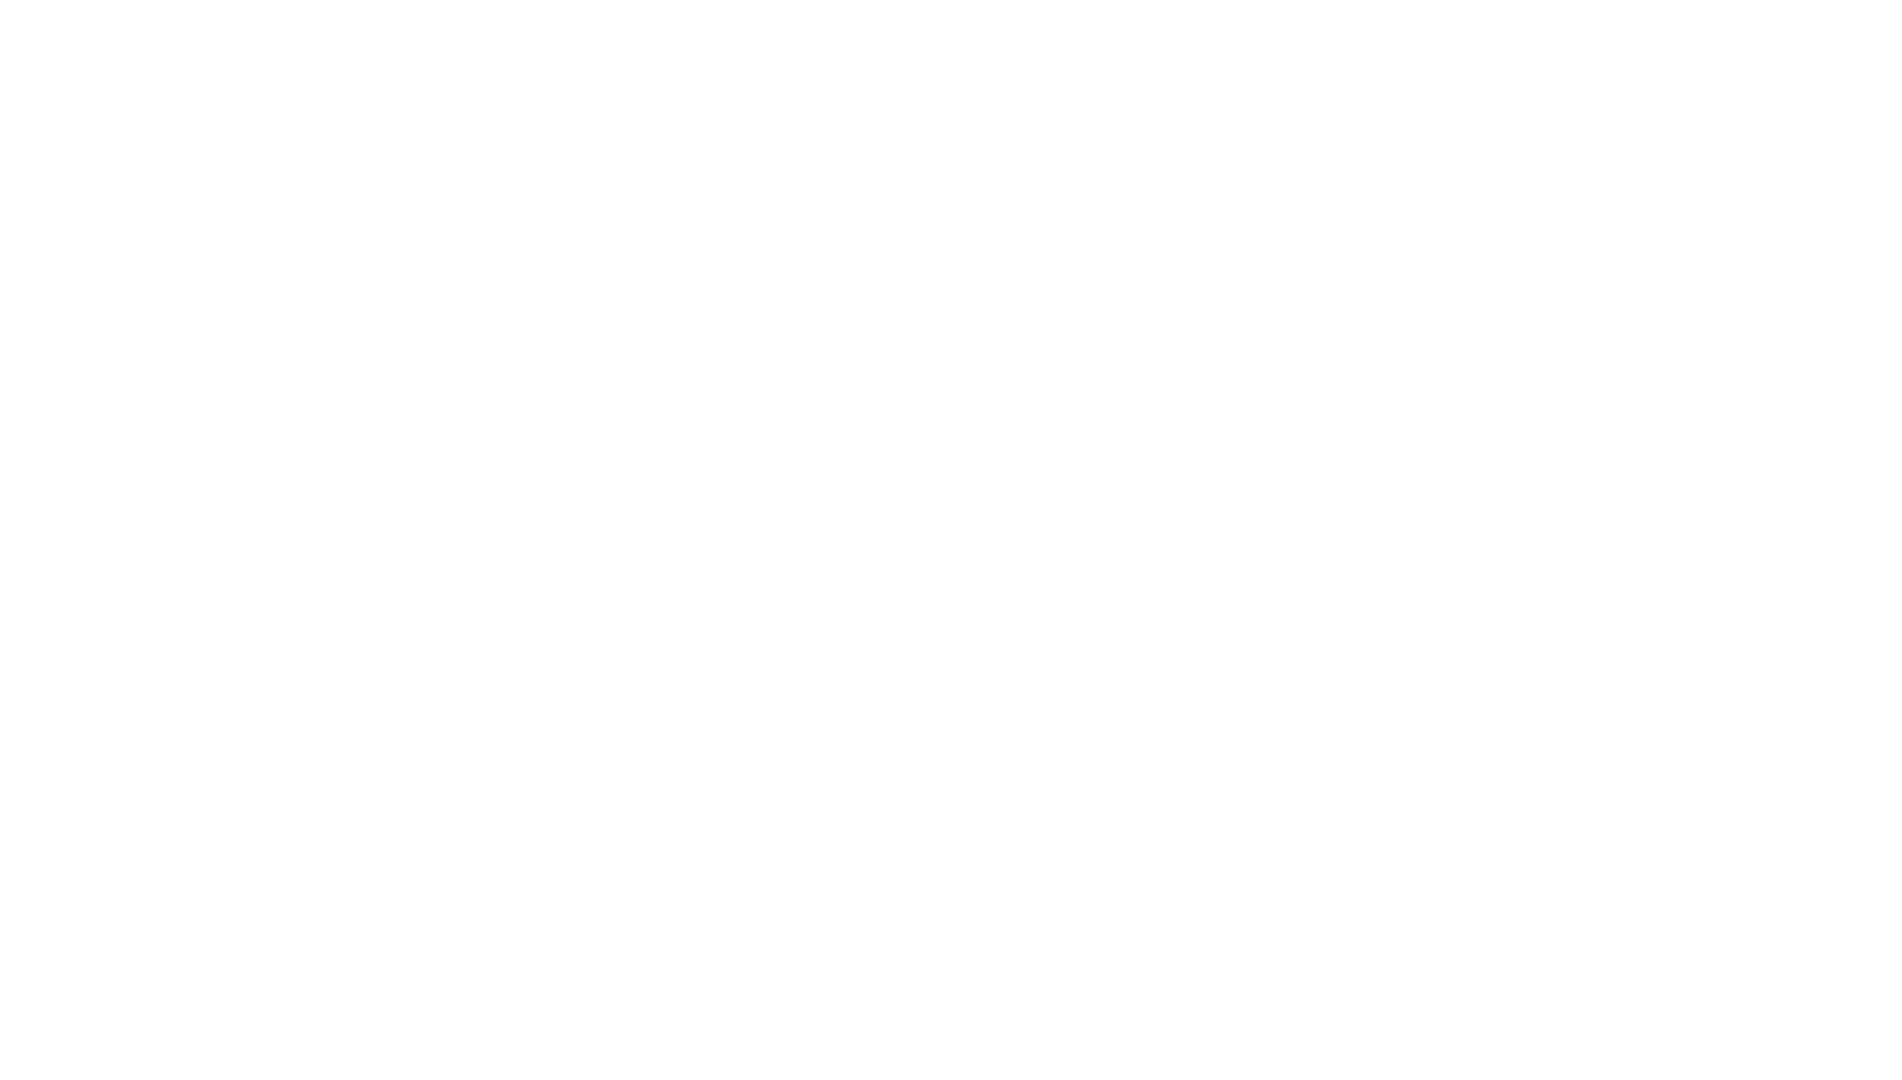 Method_01